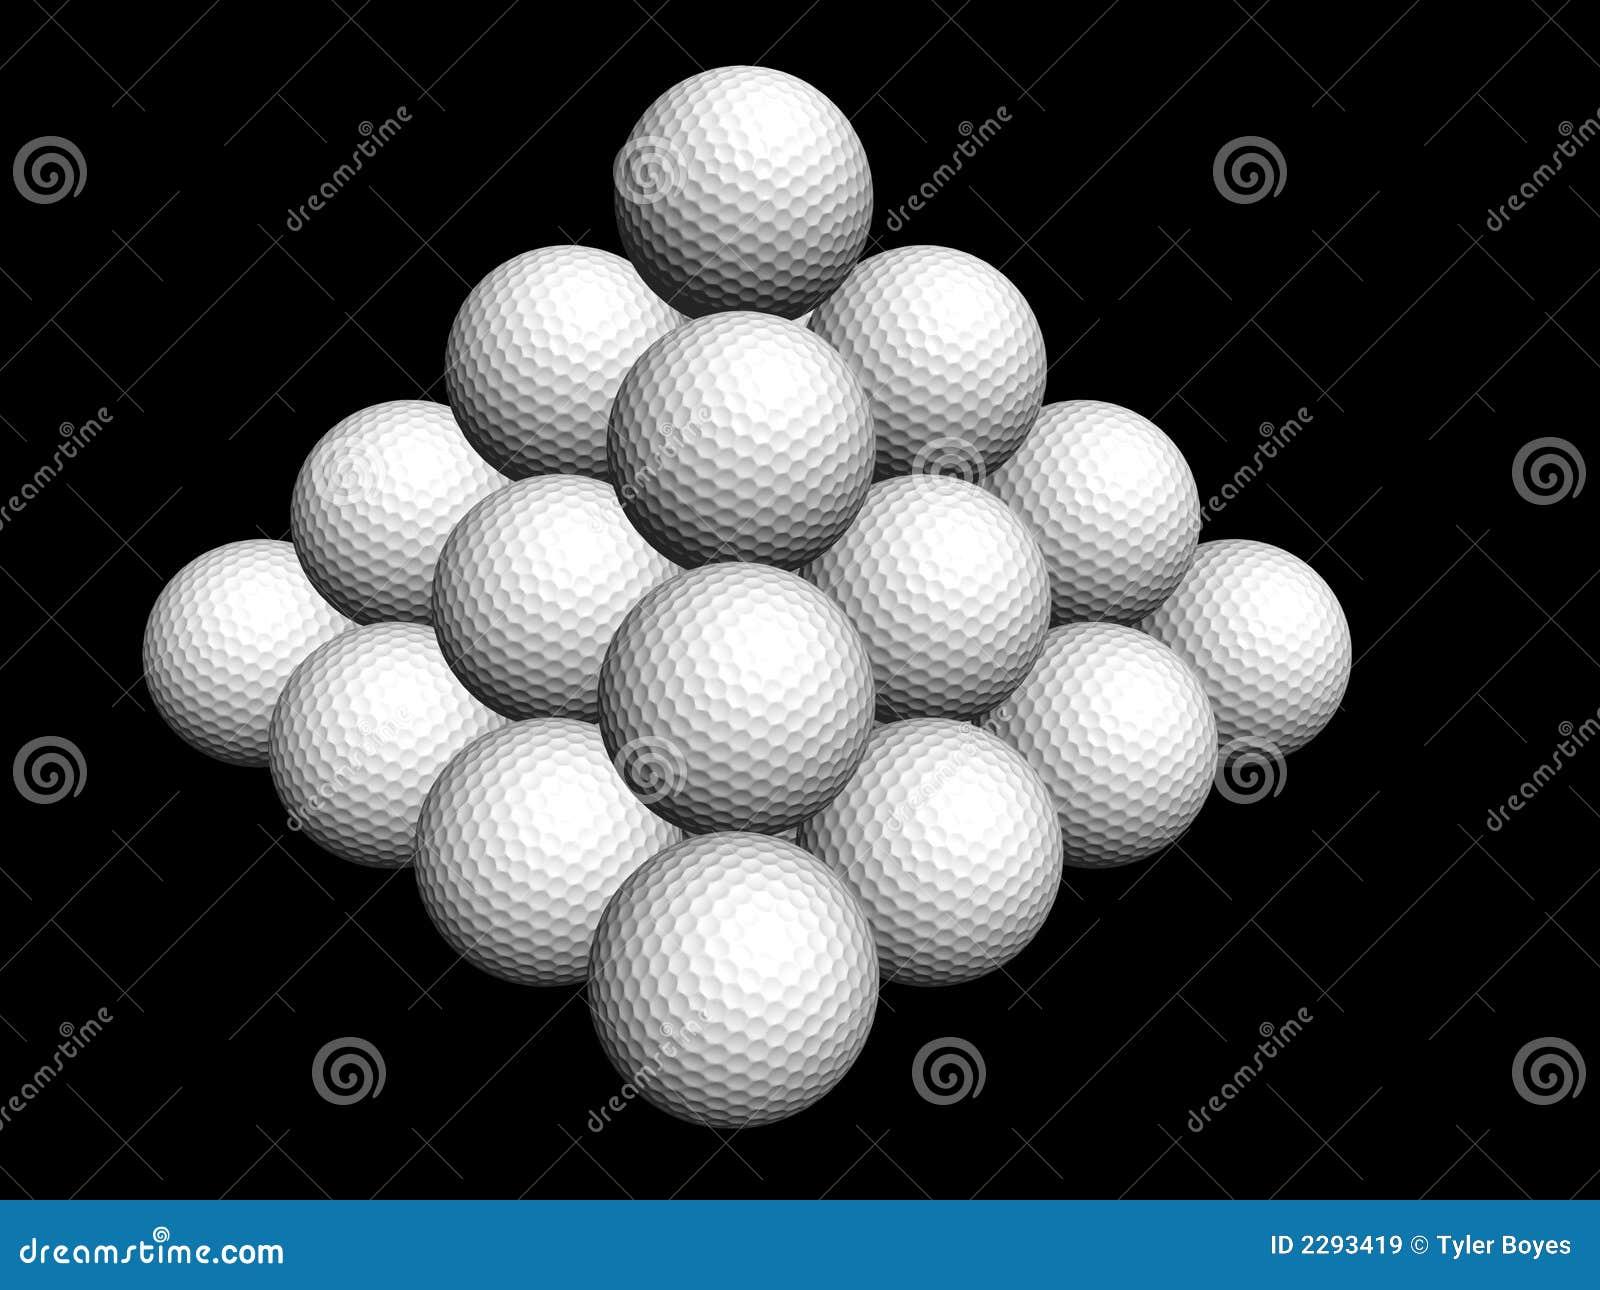 Golf Ball Pyramid Royalty Free Stock Images Image 2293419